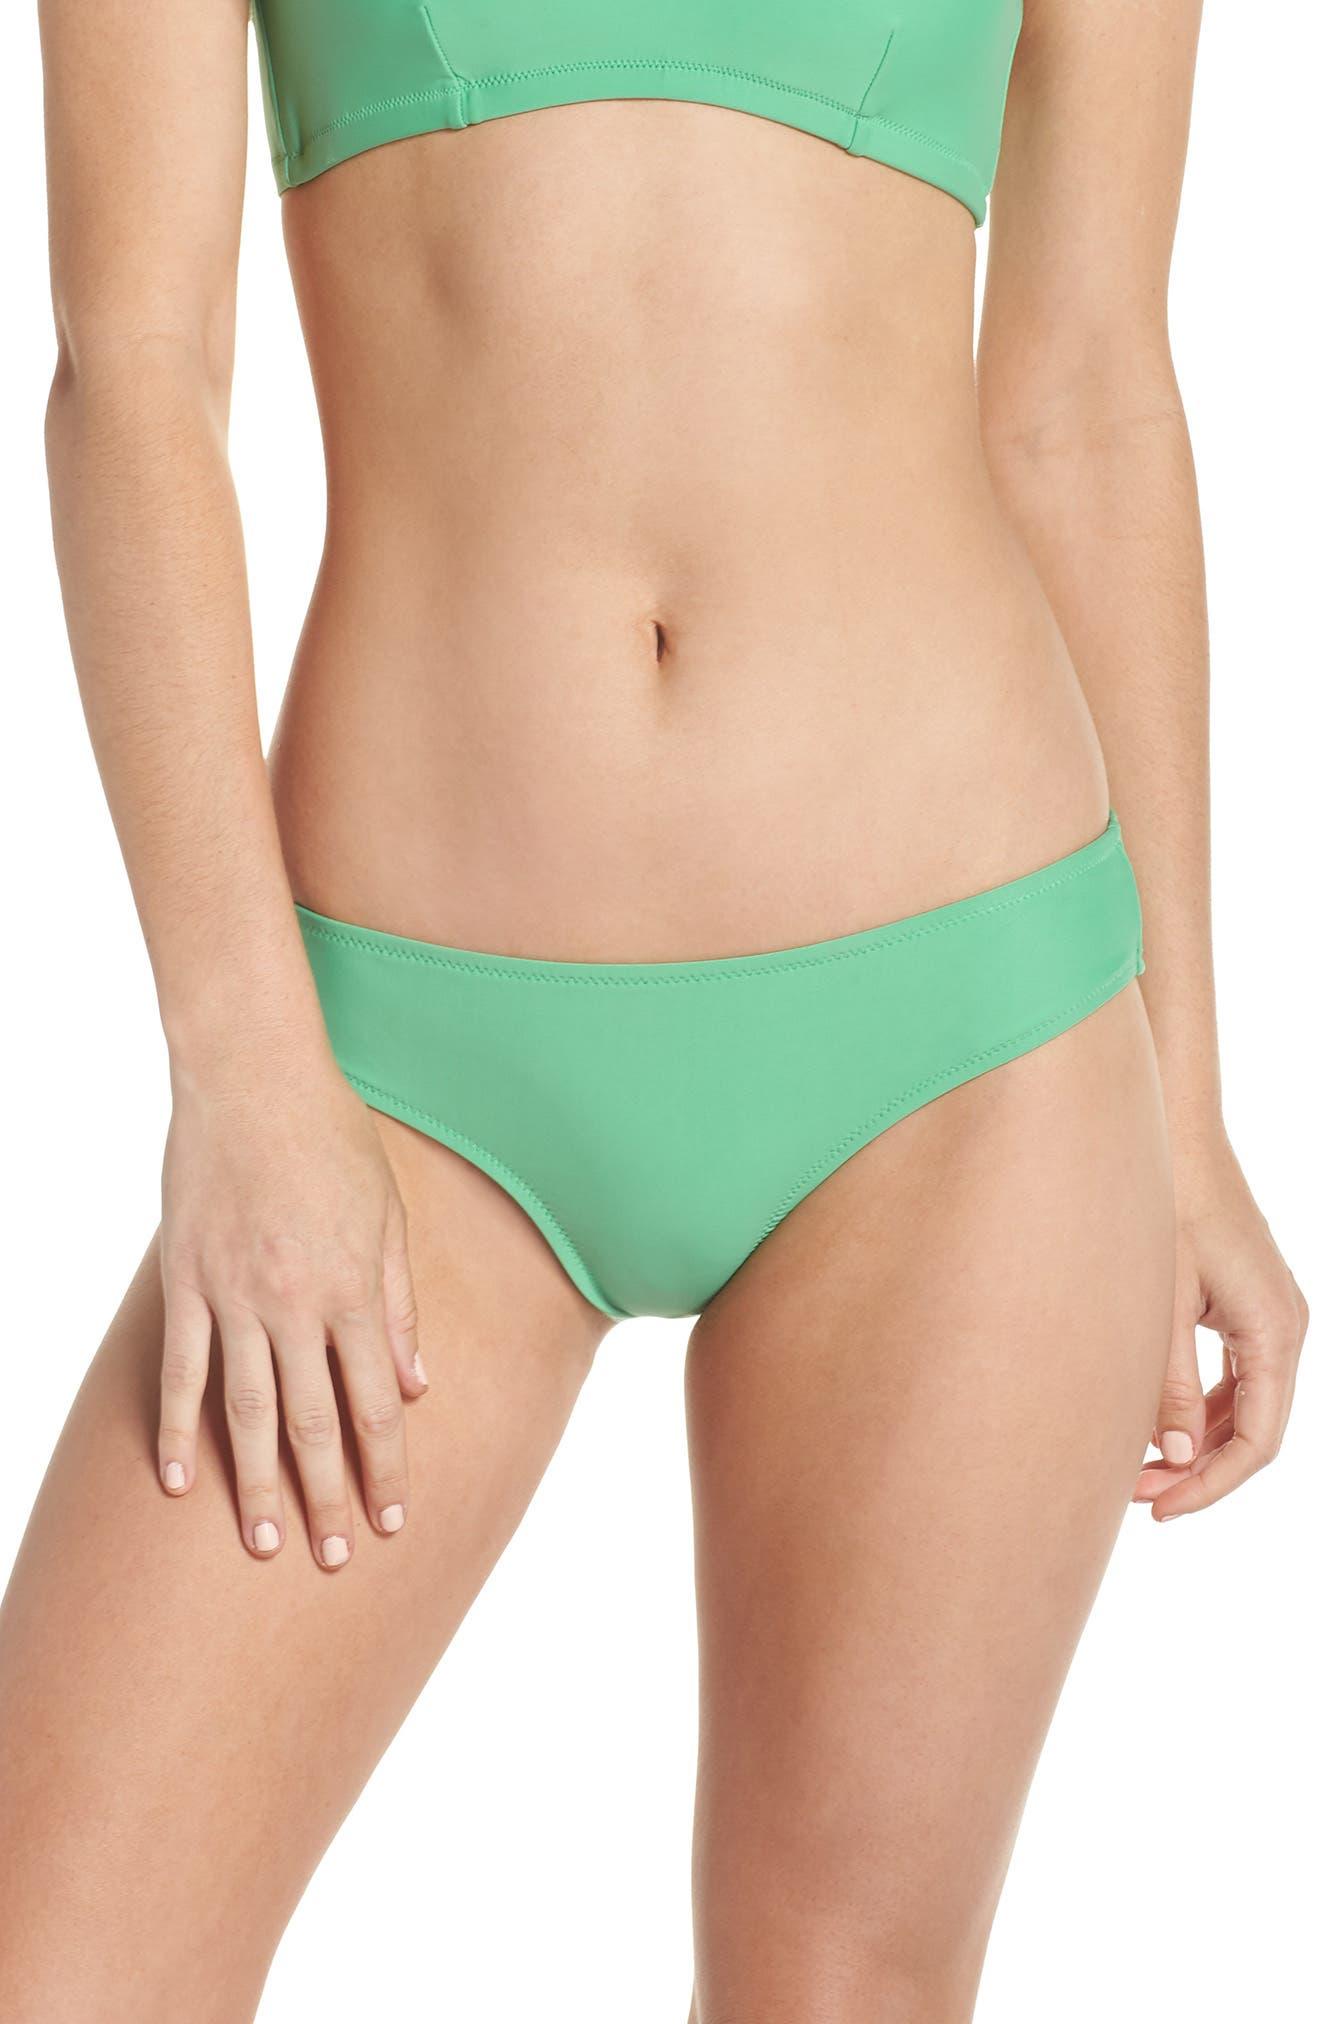 J.Crew Hipster Bikini Bottoms,                         Main,                         color, Bright Spearmint